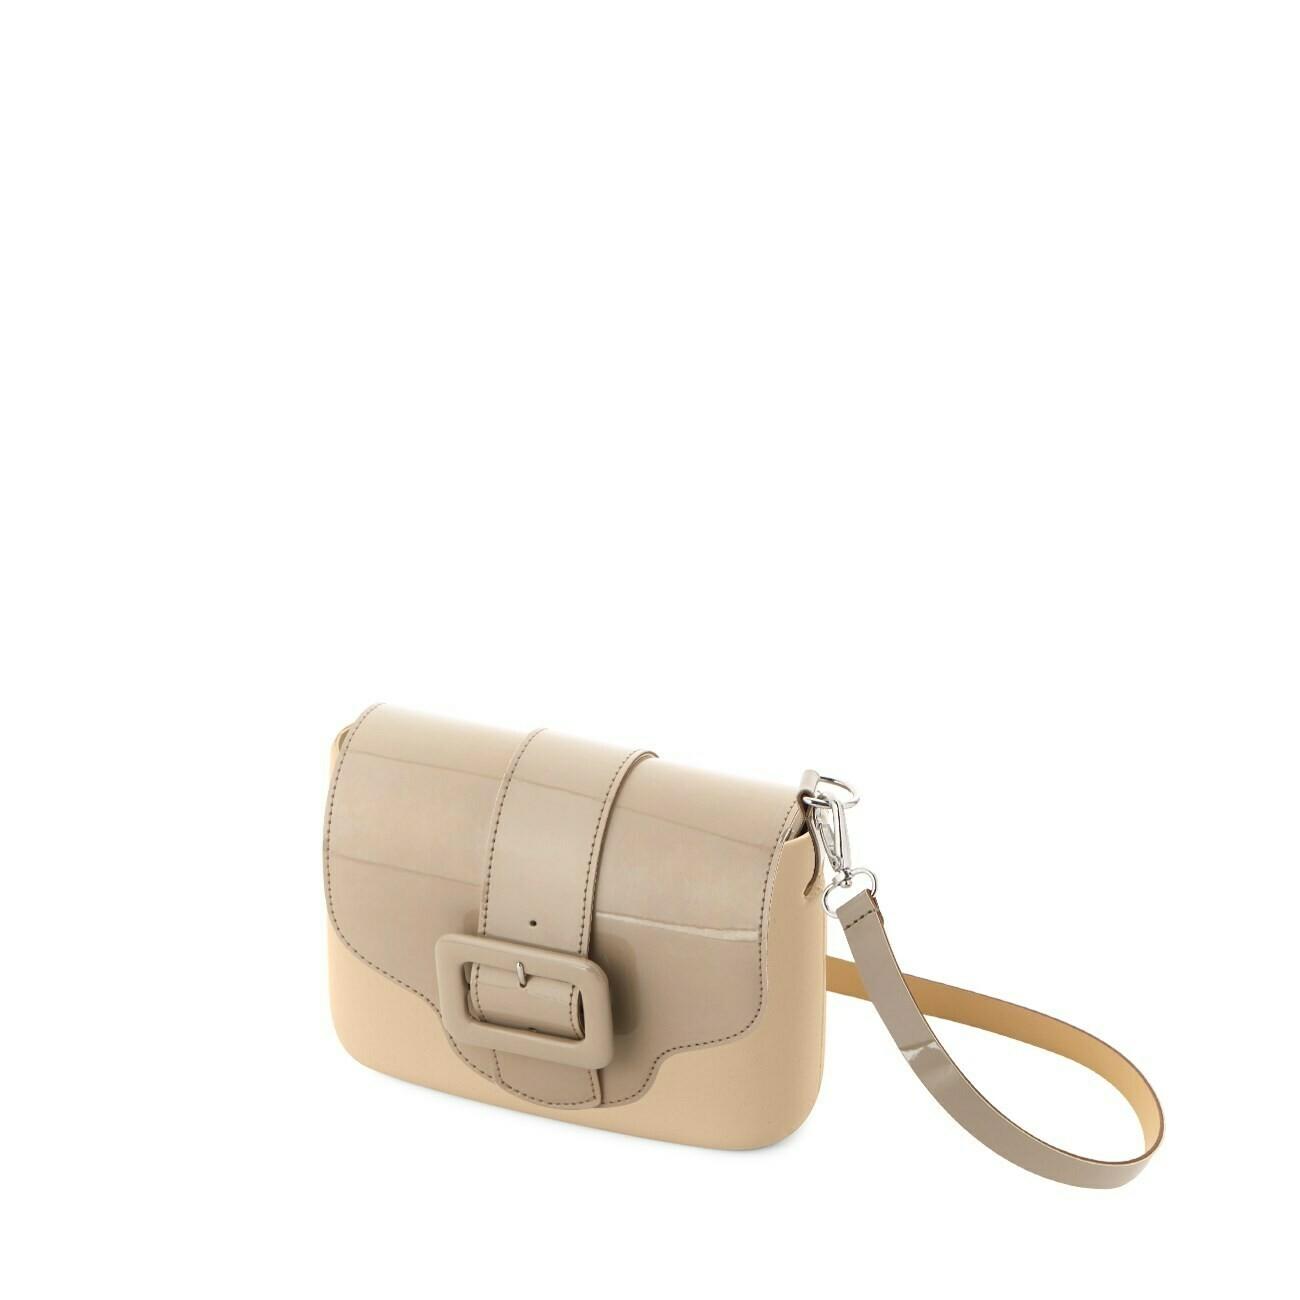 O bag pocket sabbia pattina ecopelle vernice